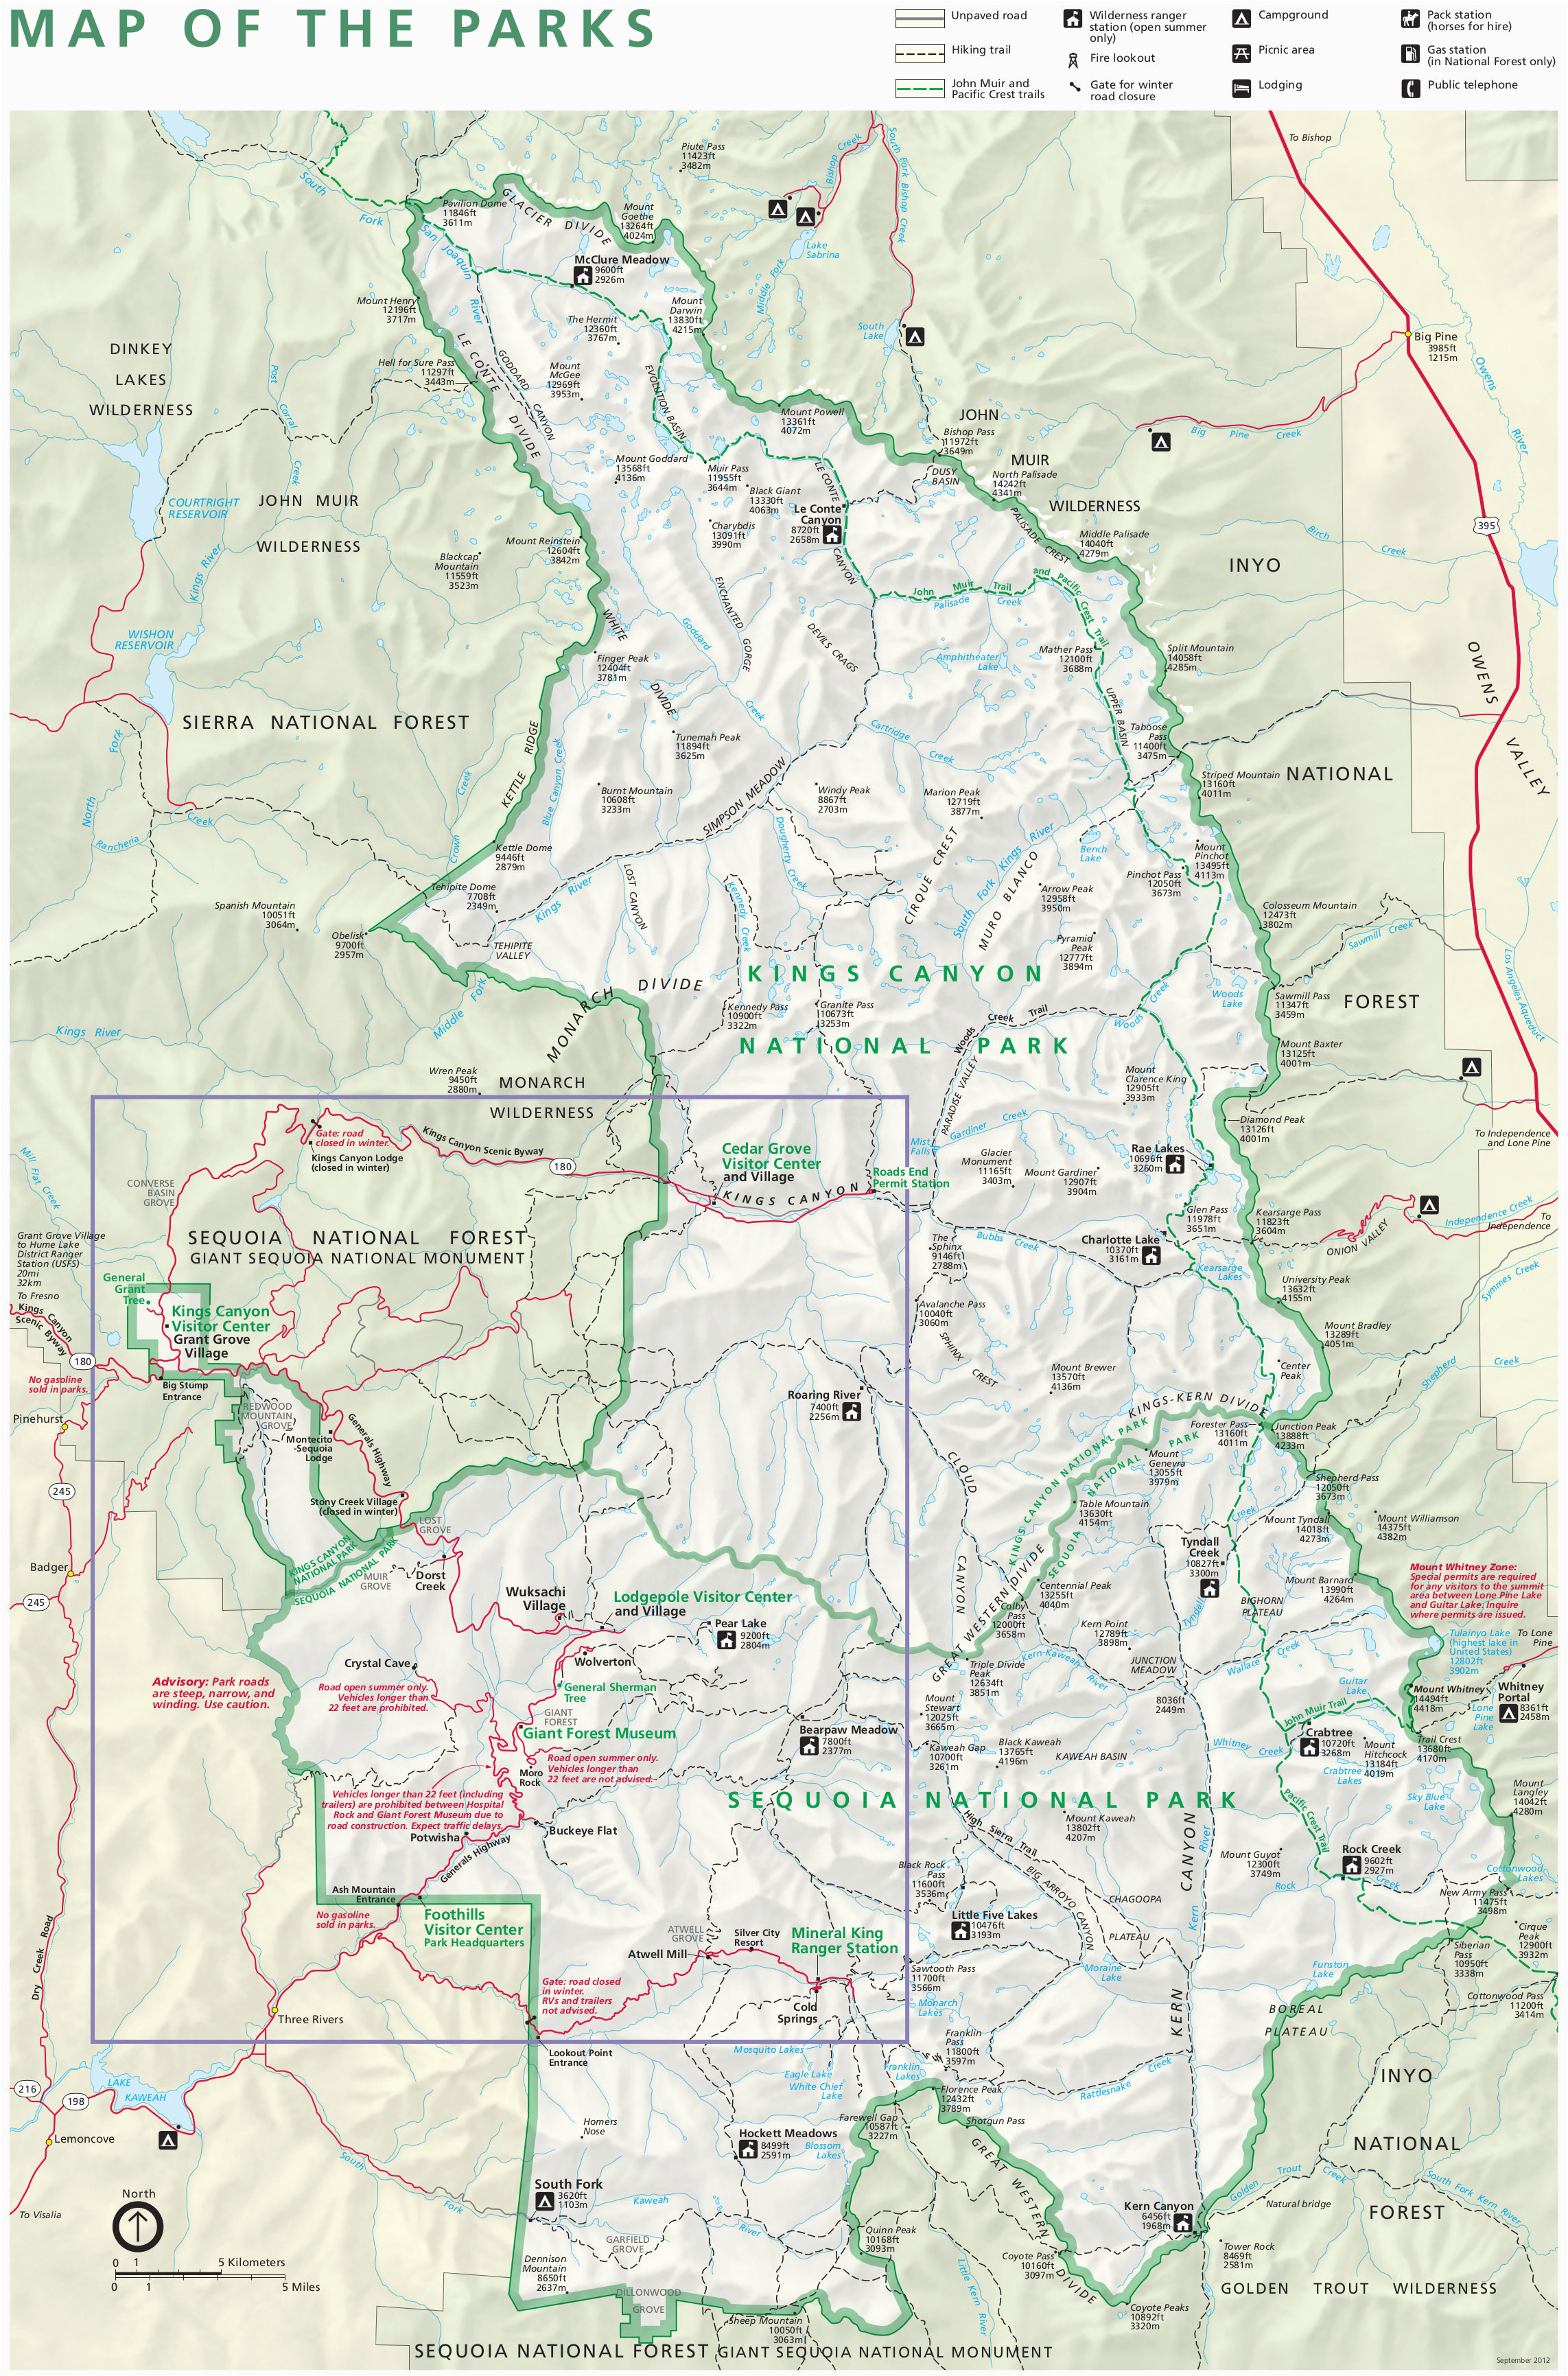 kings canyon national park wikipedia